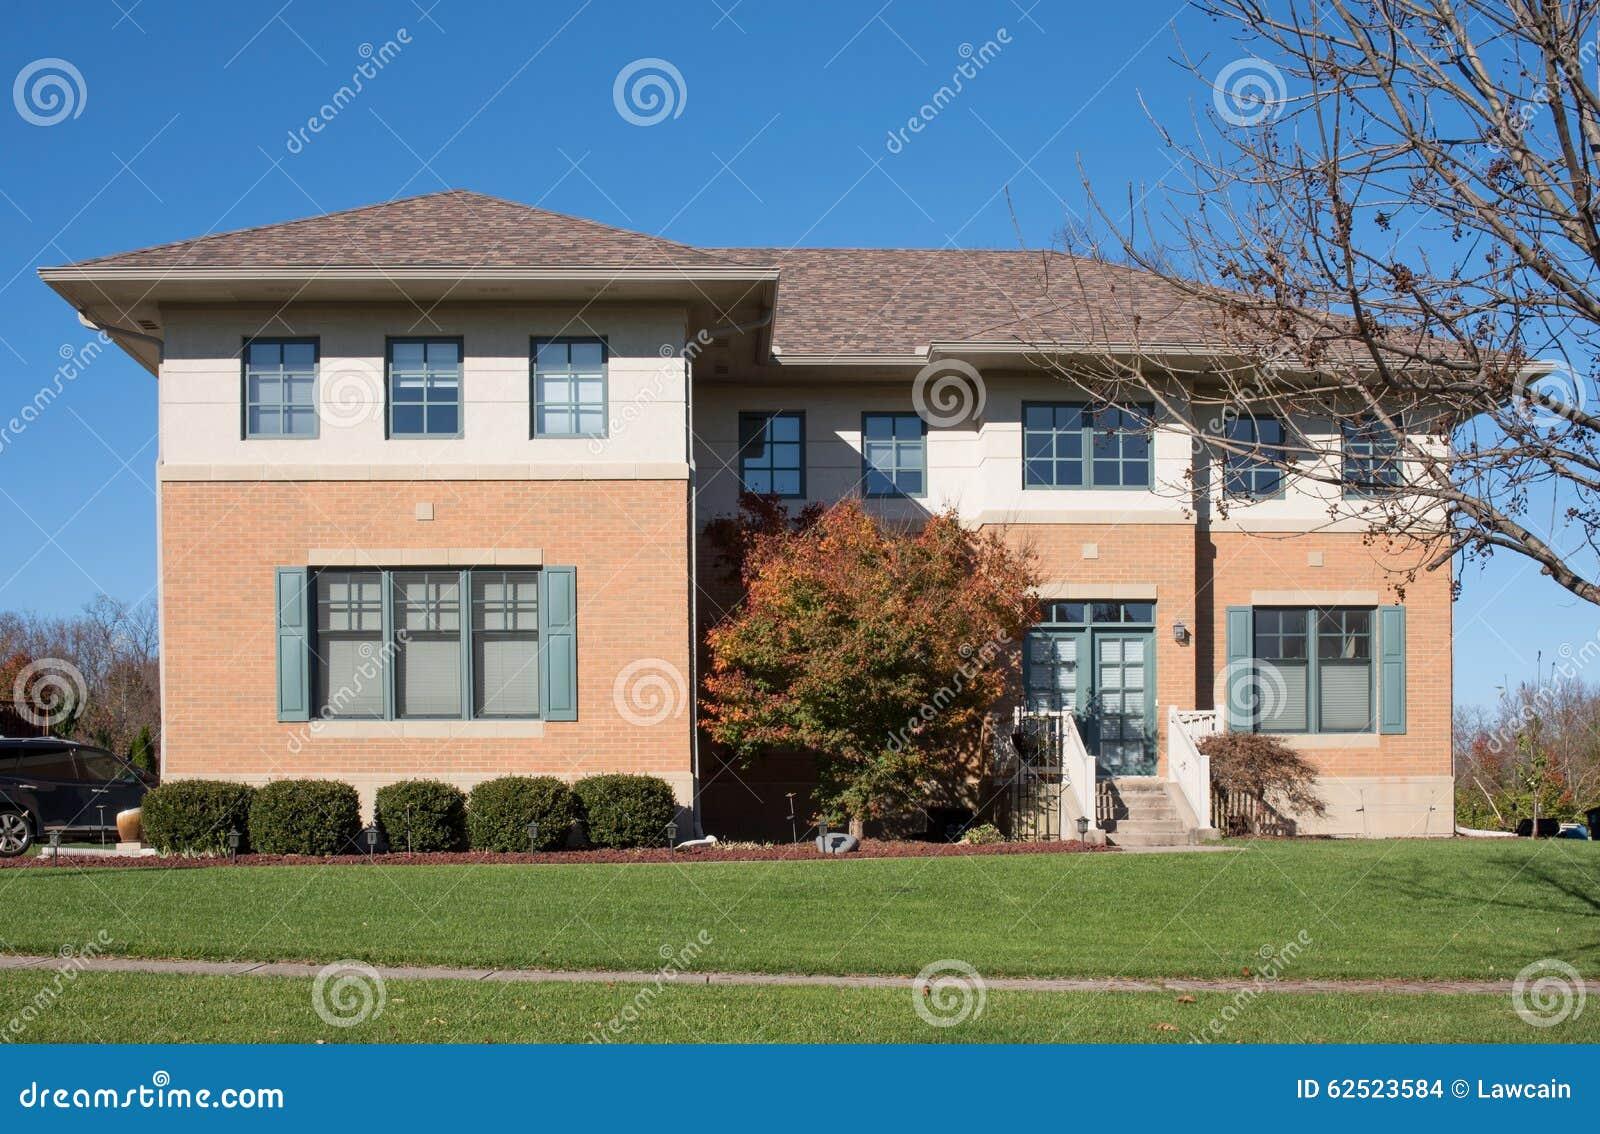 Square Modern House Stock Photo Image 62523584